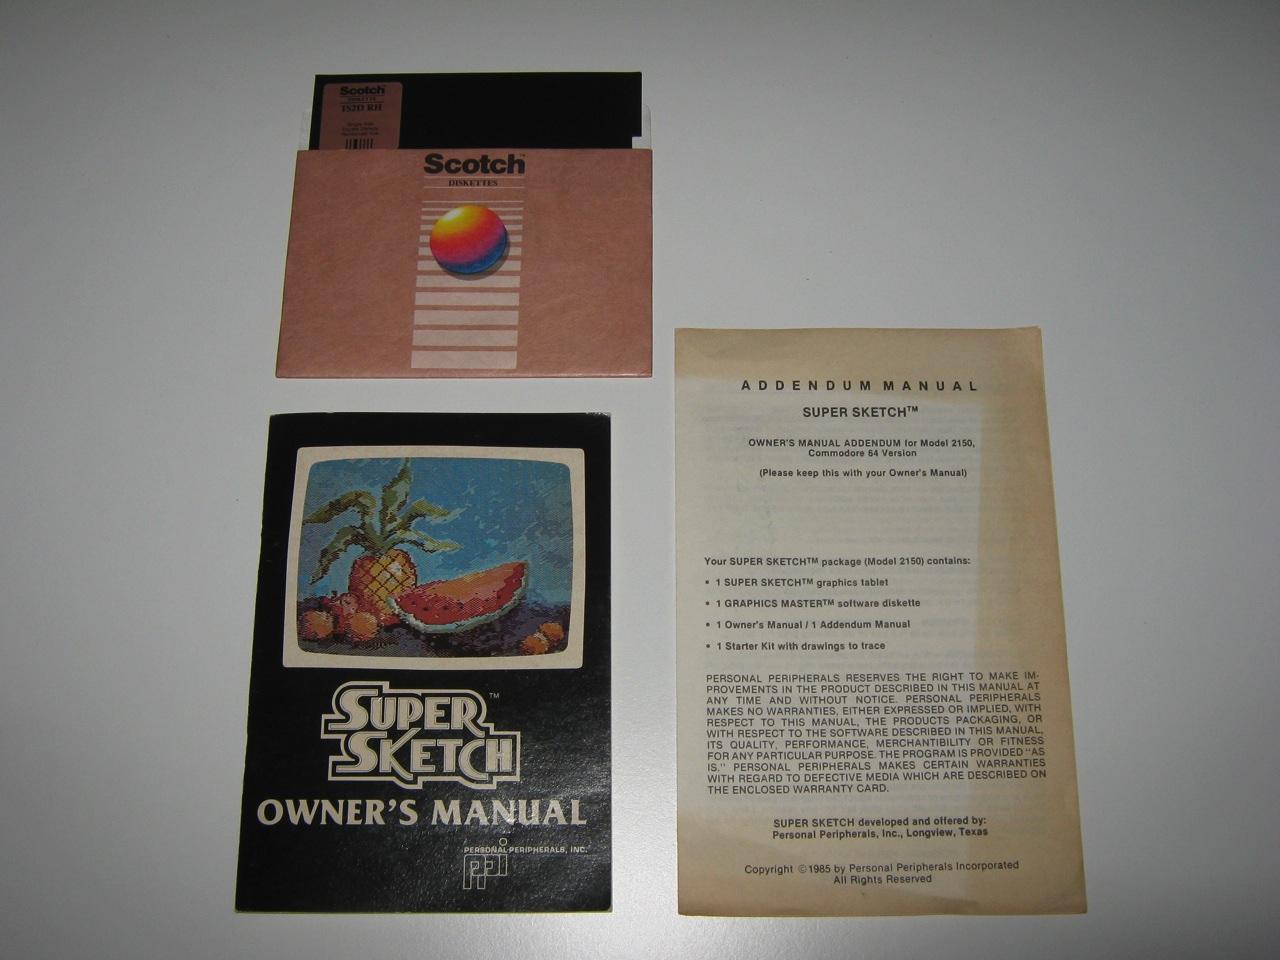 Commodore   nIGHTFALL Blog / RetroComputerMania com - Part 31